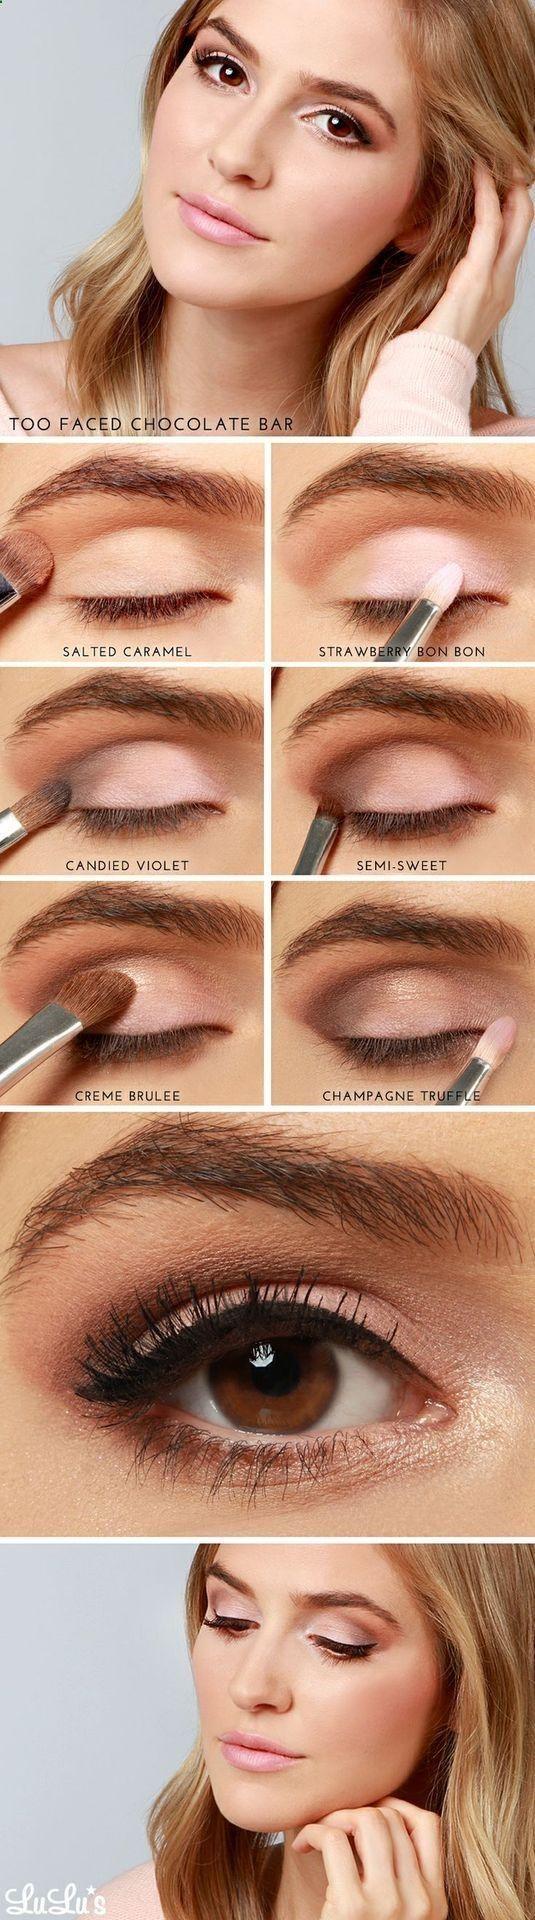 Too Faced Chocolate Bar. Soft day eye makeup tutorial #evatornadoblog | gnarlyha...